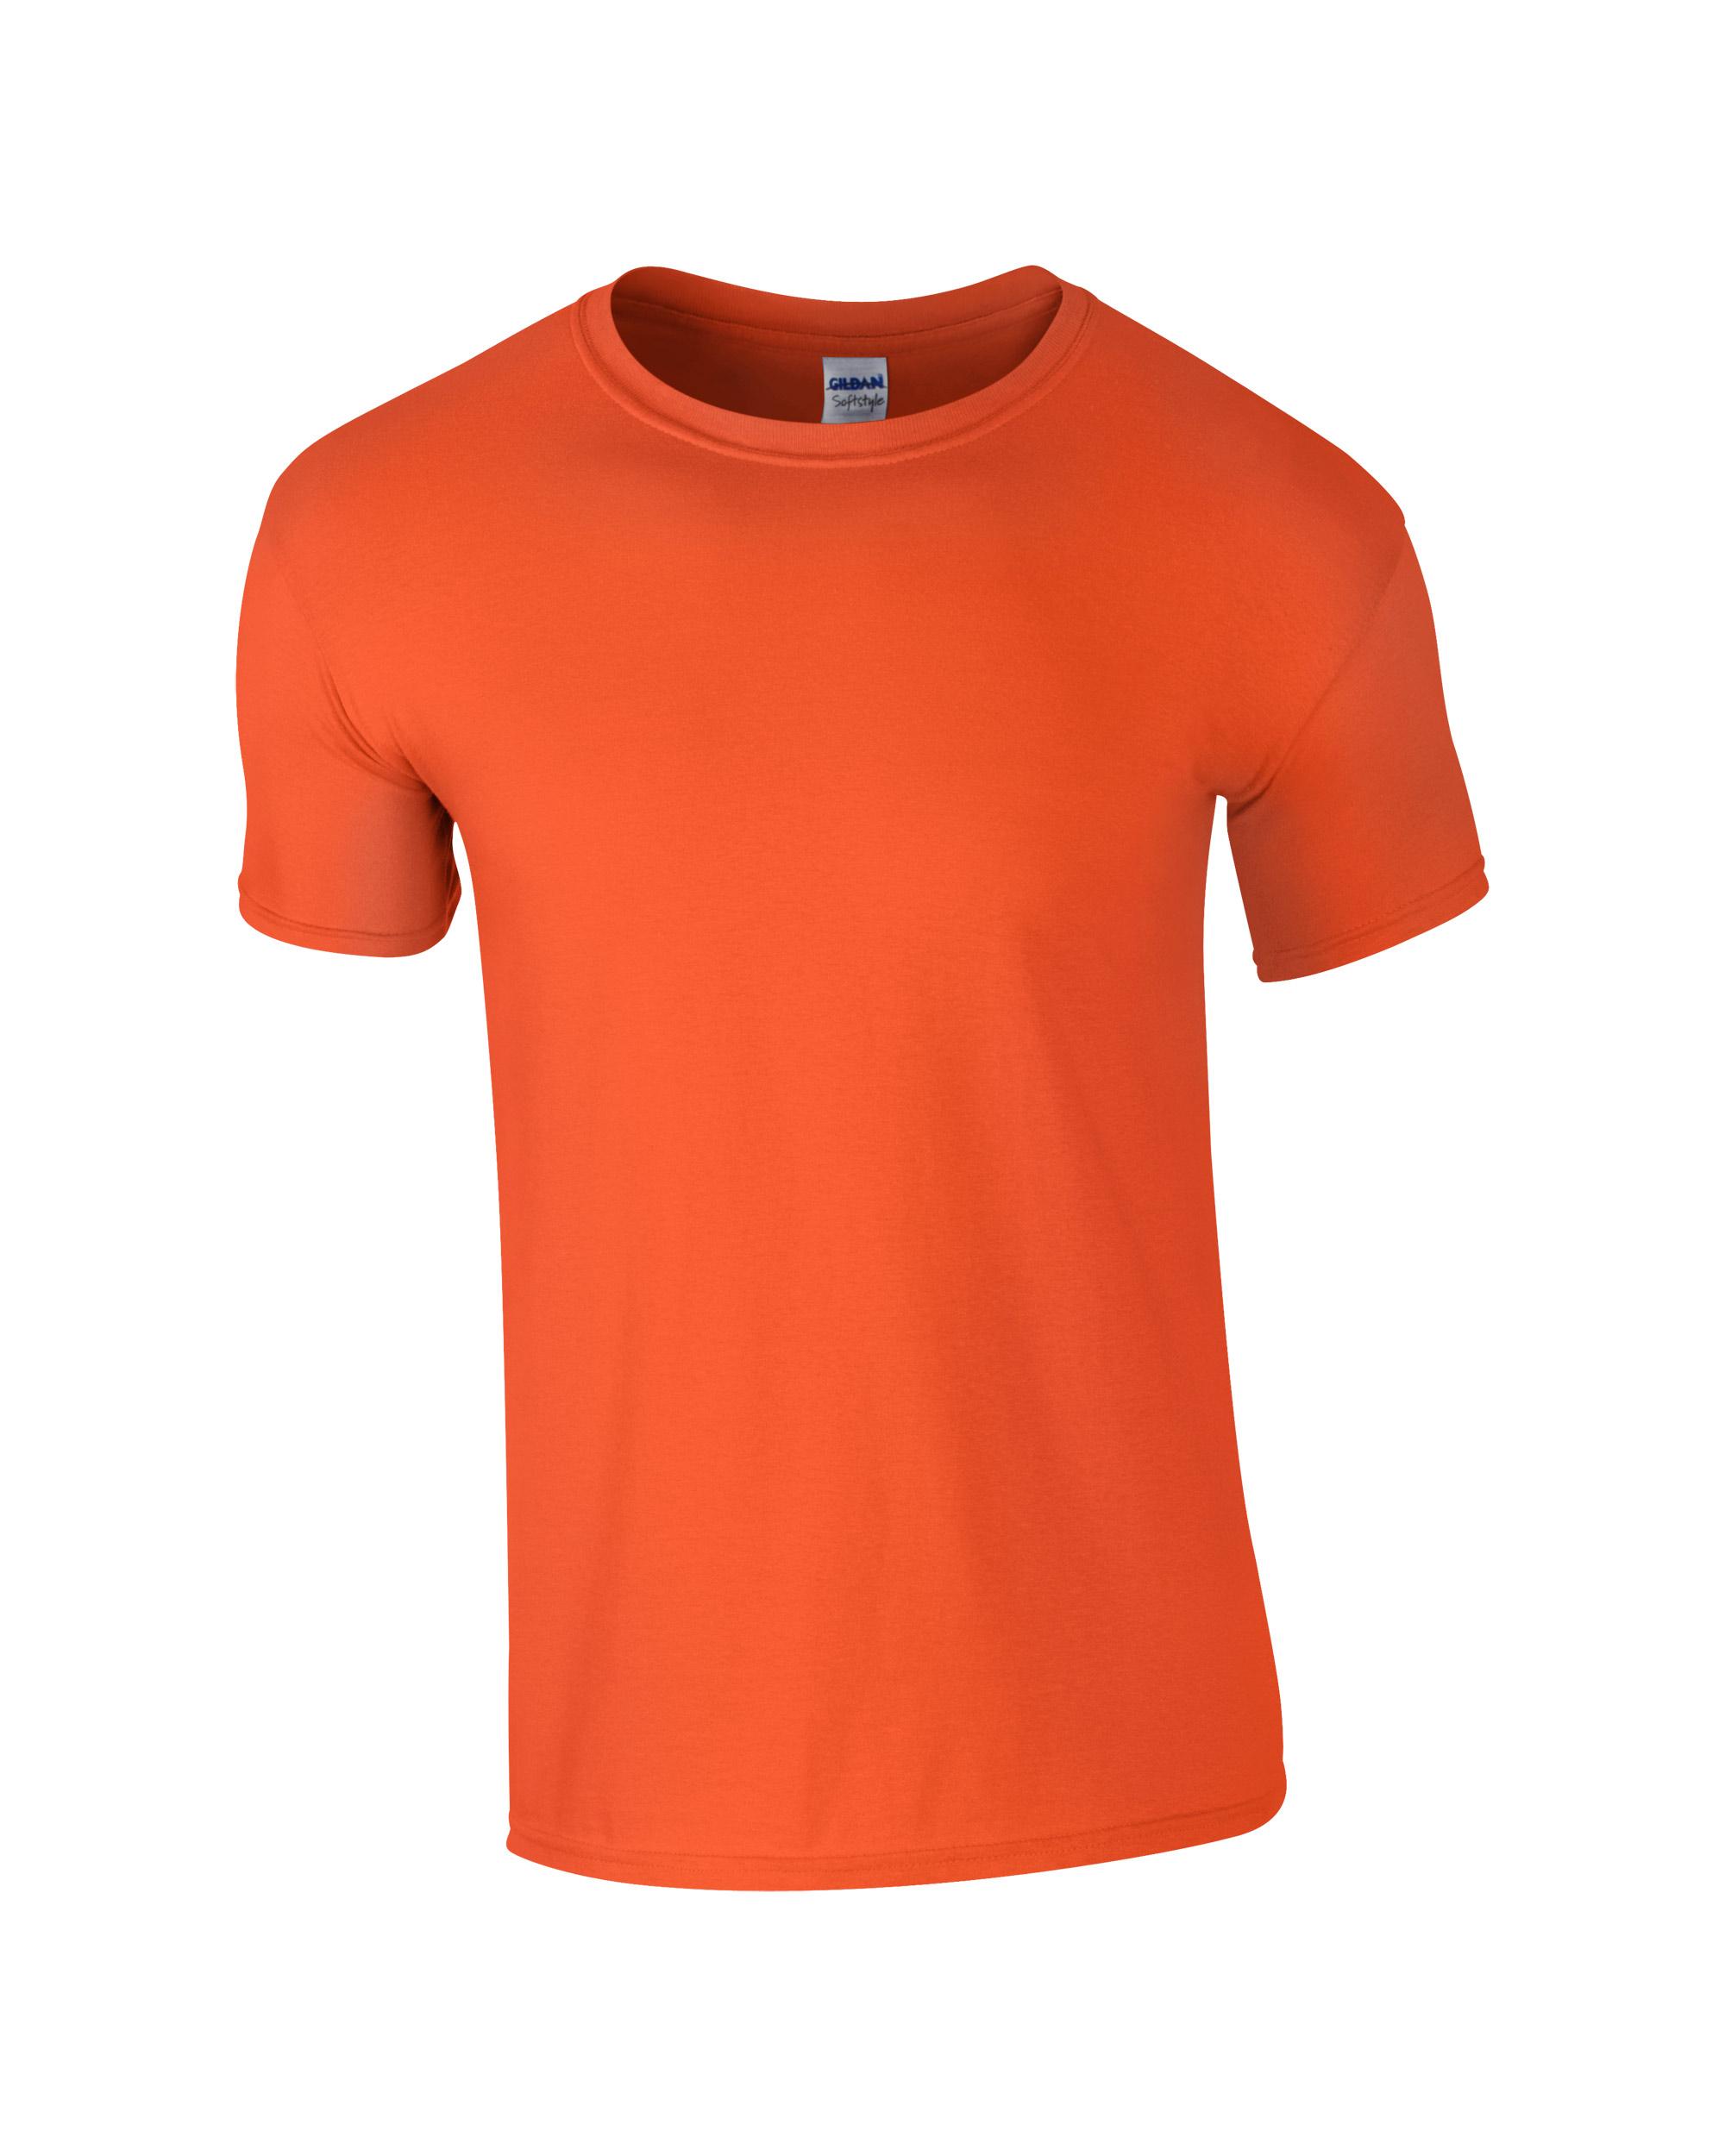 Muška T-shirt majica kratki rukav narančasta